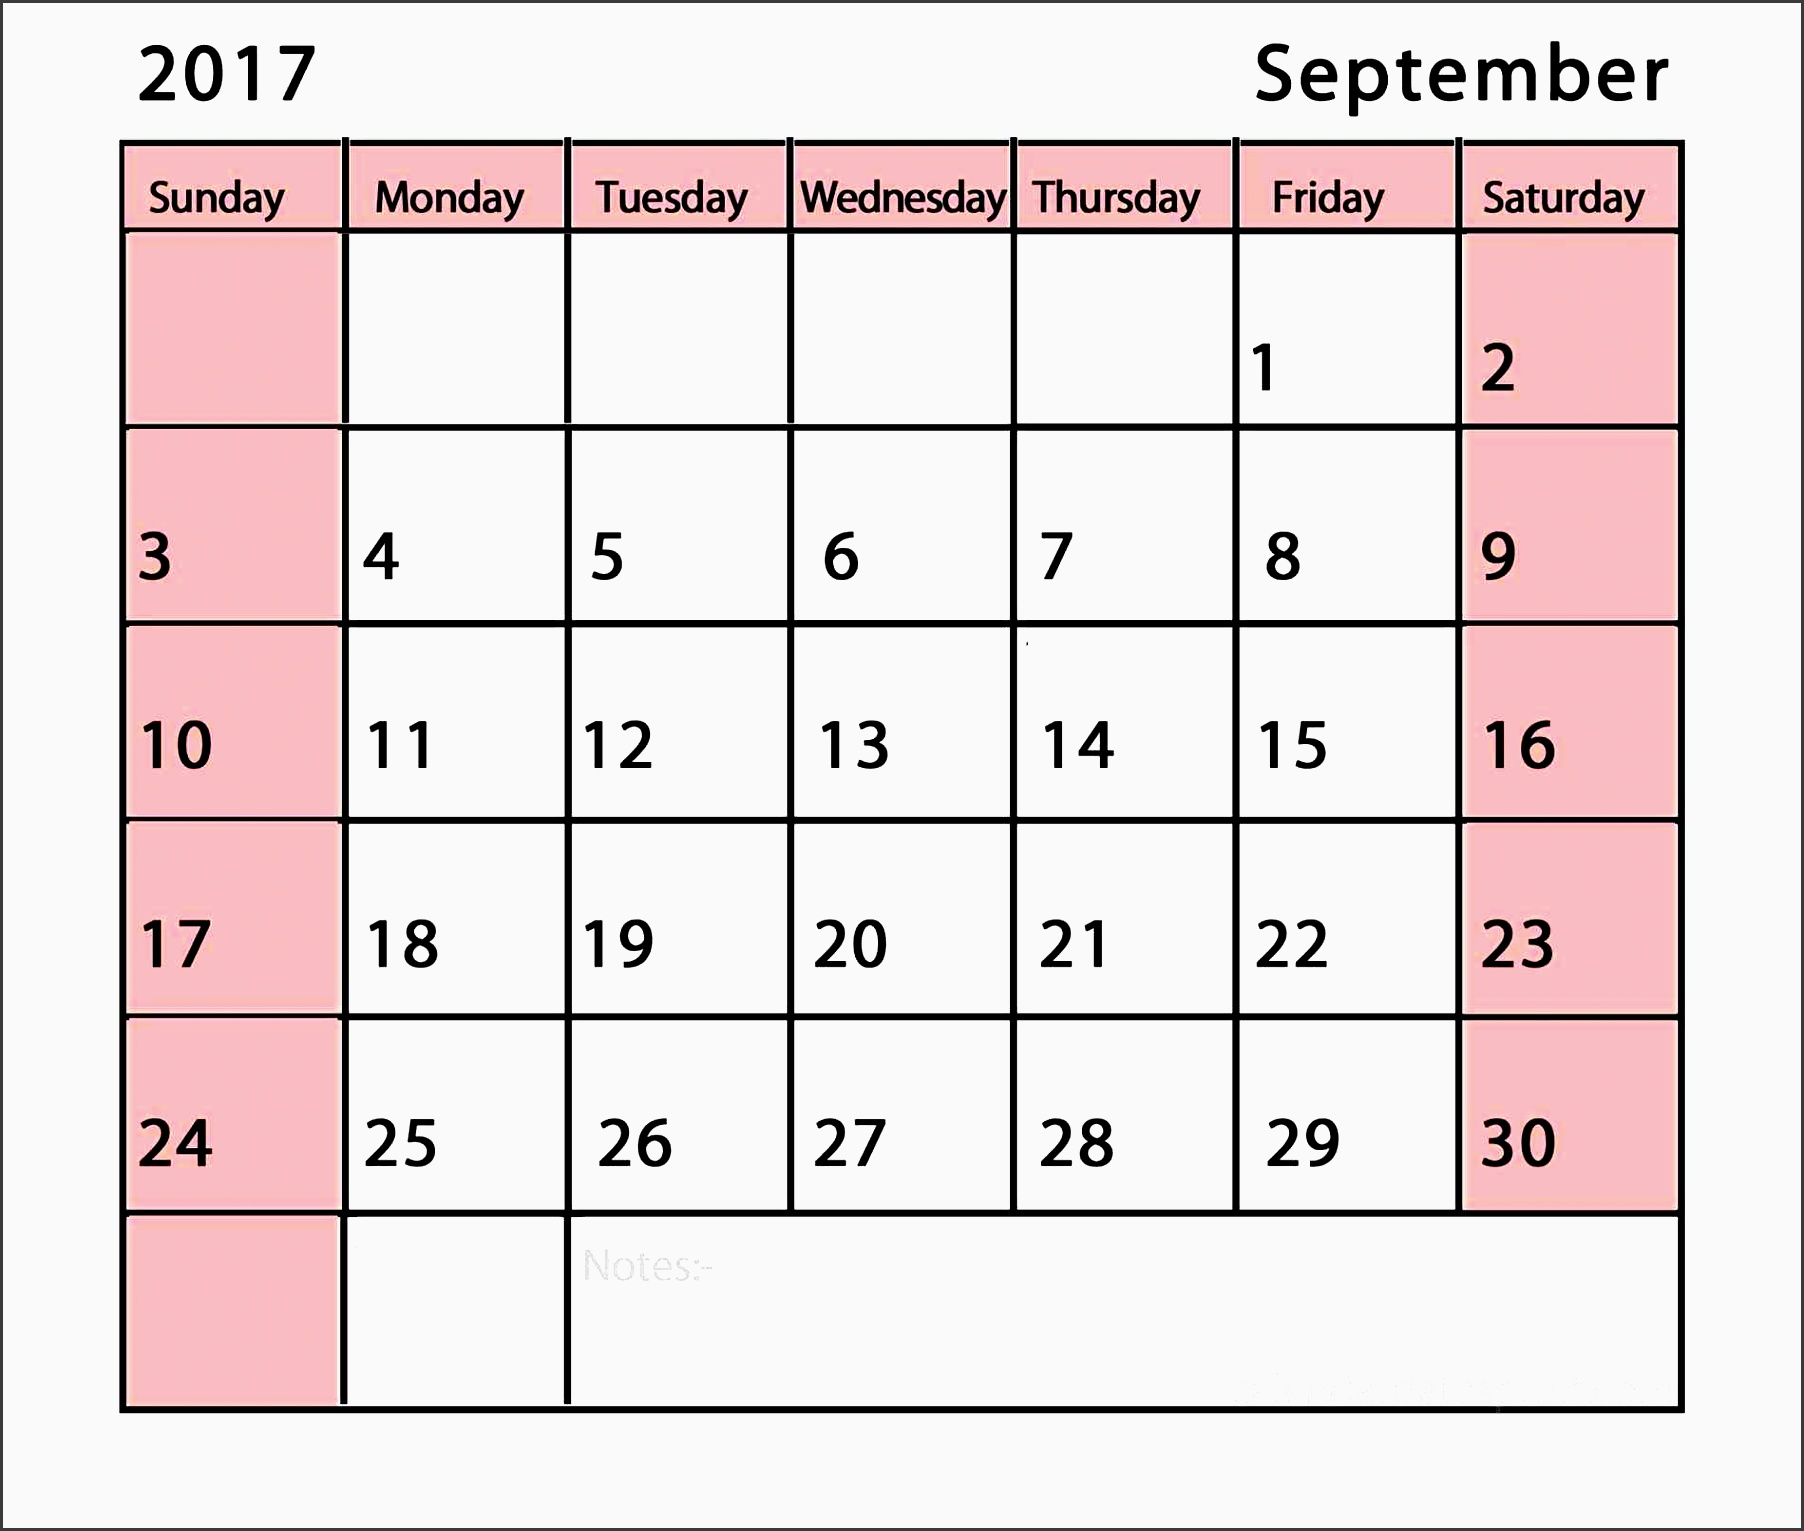 format calendar excel free printable templates xls calendar staff vacation planner template excel free printable templates